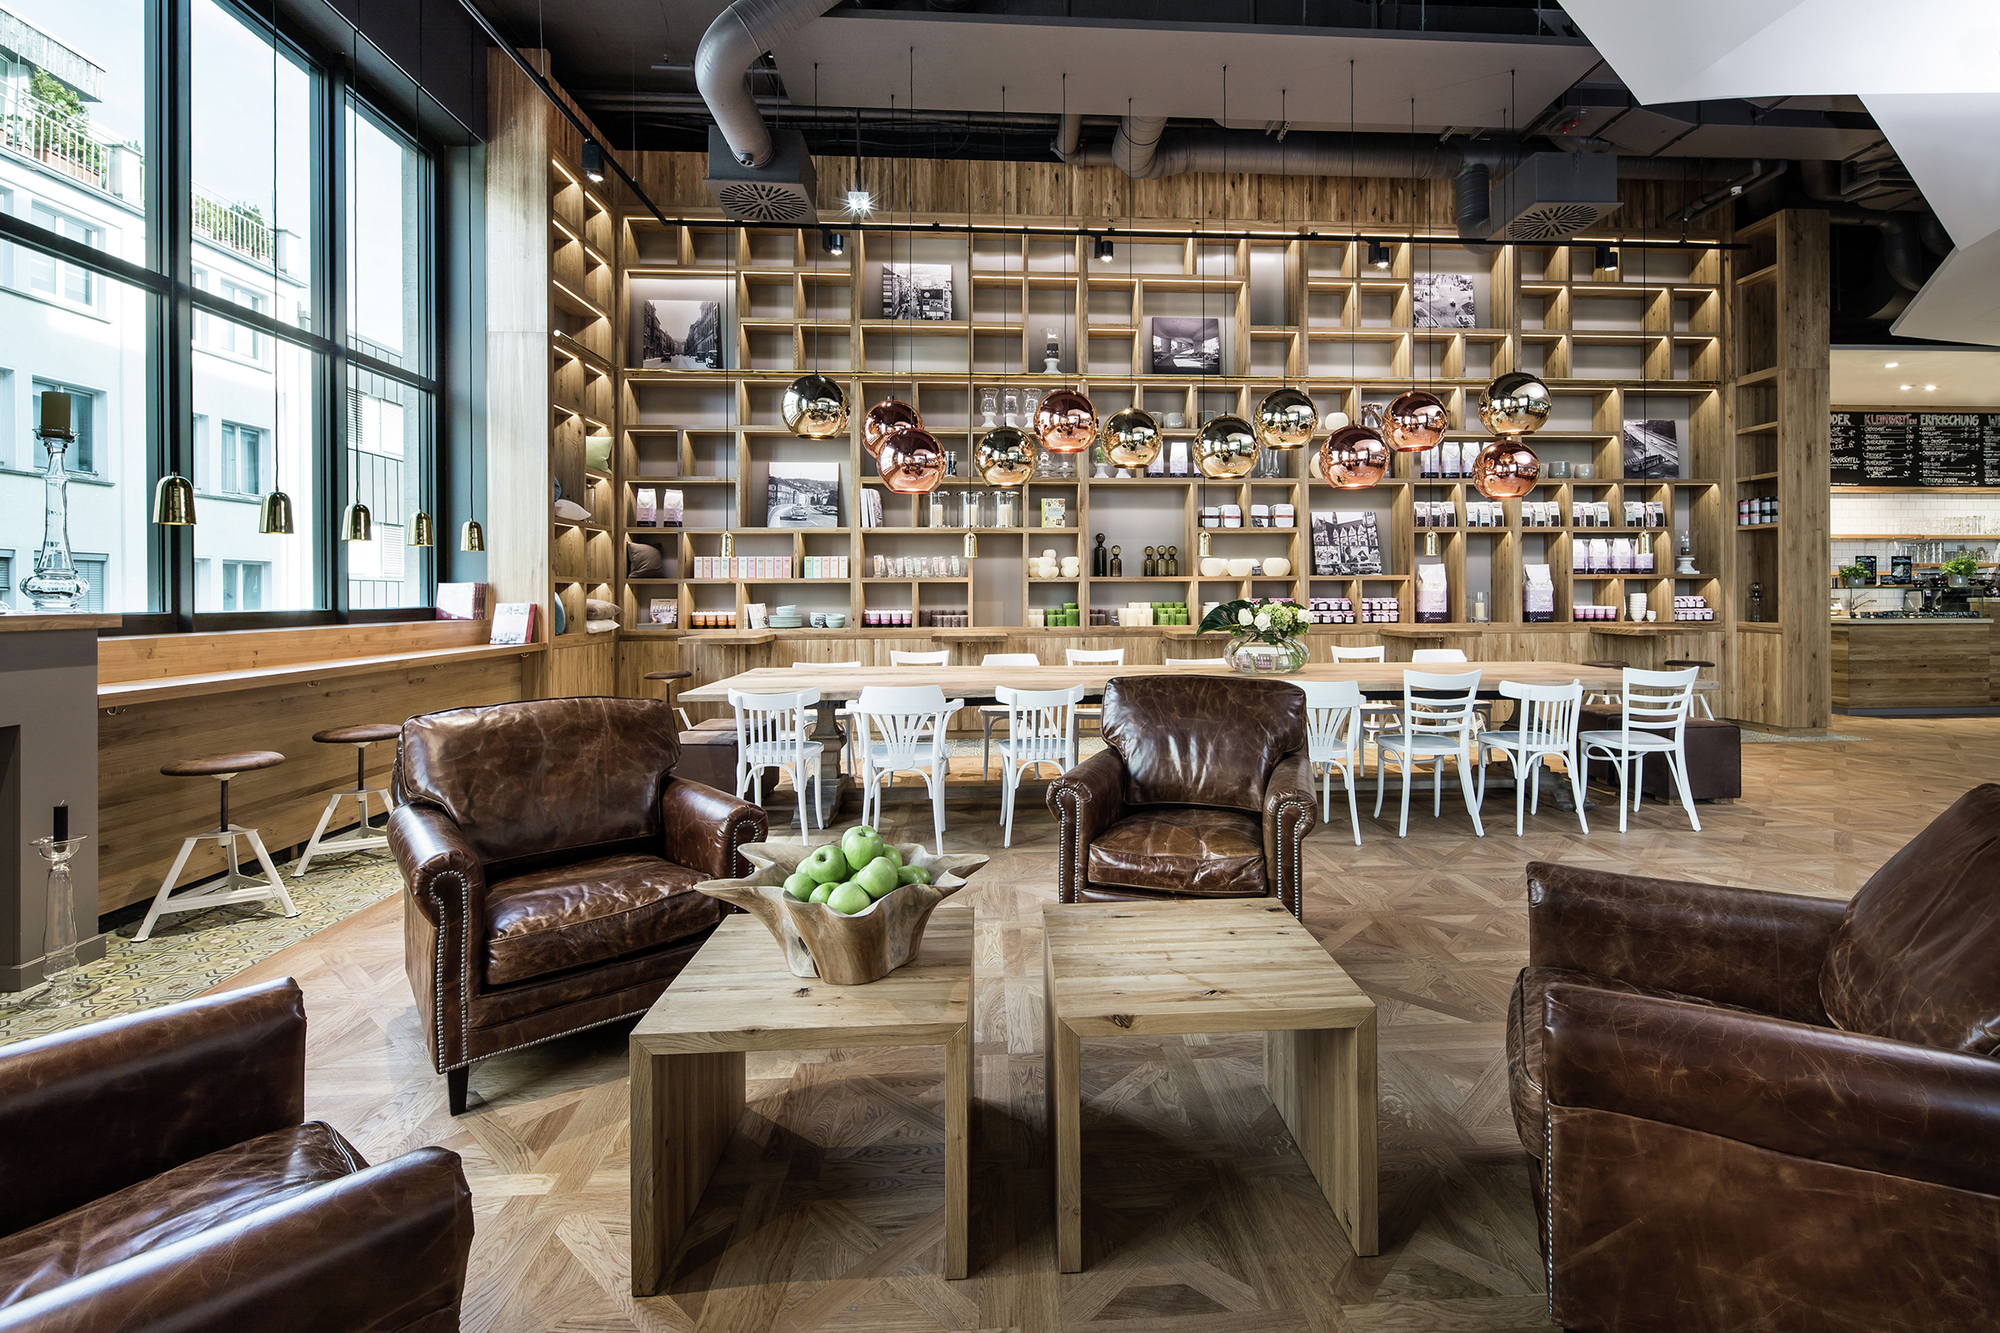 Gallery of pano brot kaffee dia dittel architekten 1 for Interior design gmbh